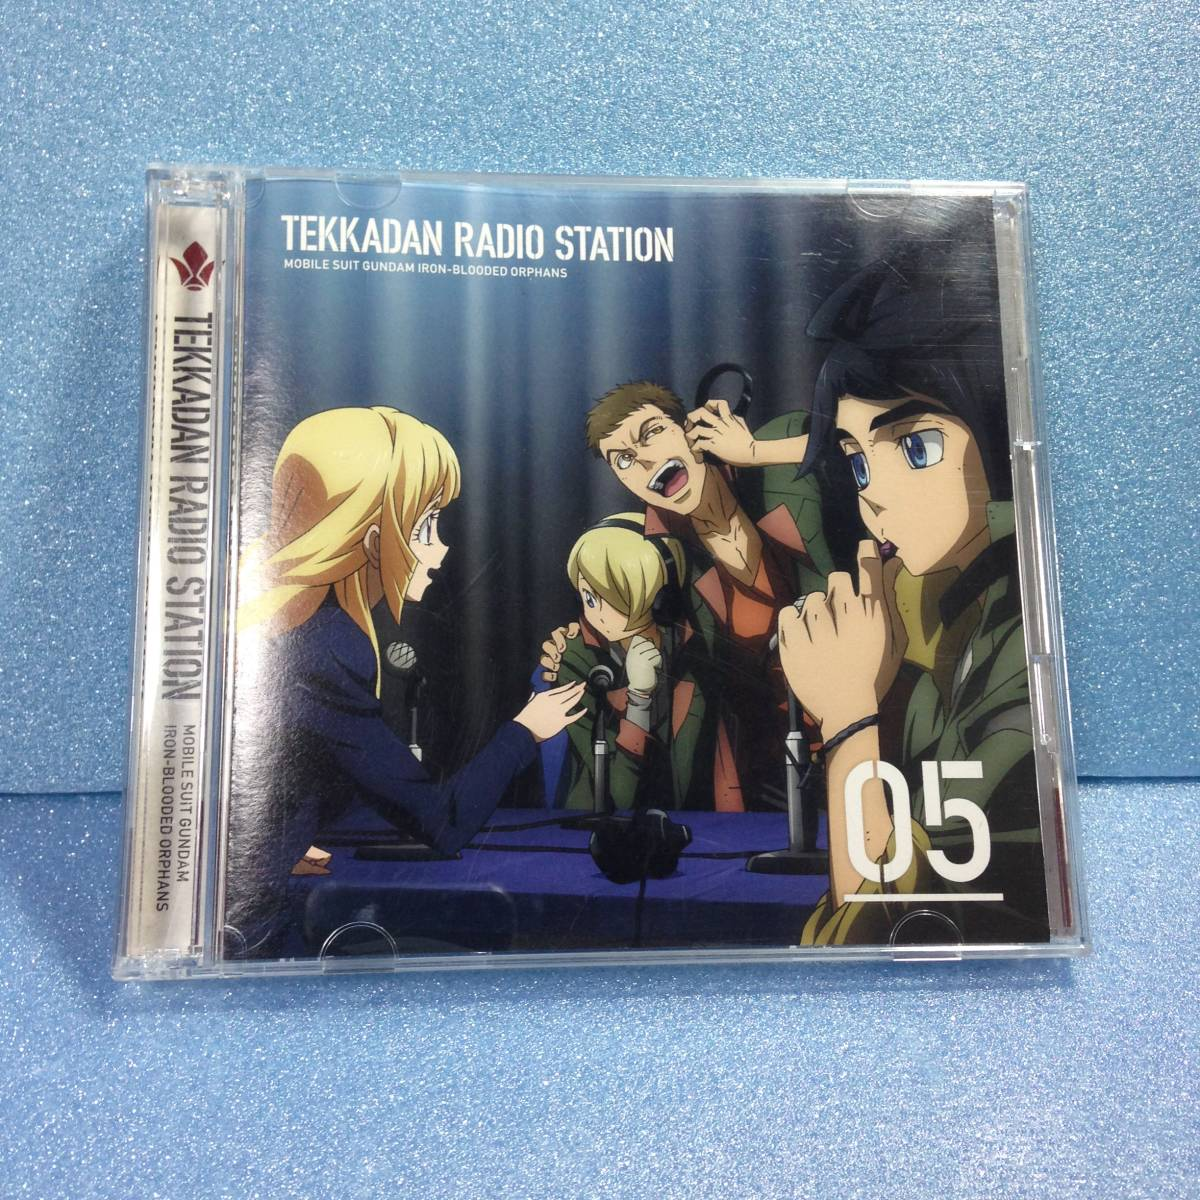 ◆(CD2枚組) TEKKADAN RADIO STATION 05 ラジオCD 鉄華団放送局 Vol.5 機動戦士ガンダム 鉄血のオルフェンズ